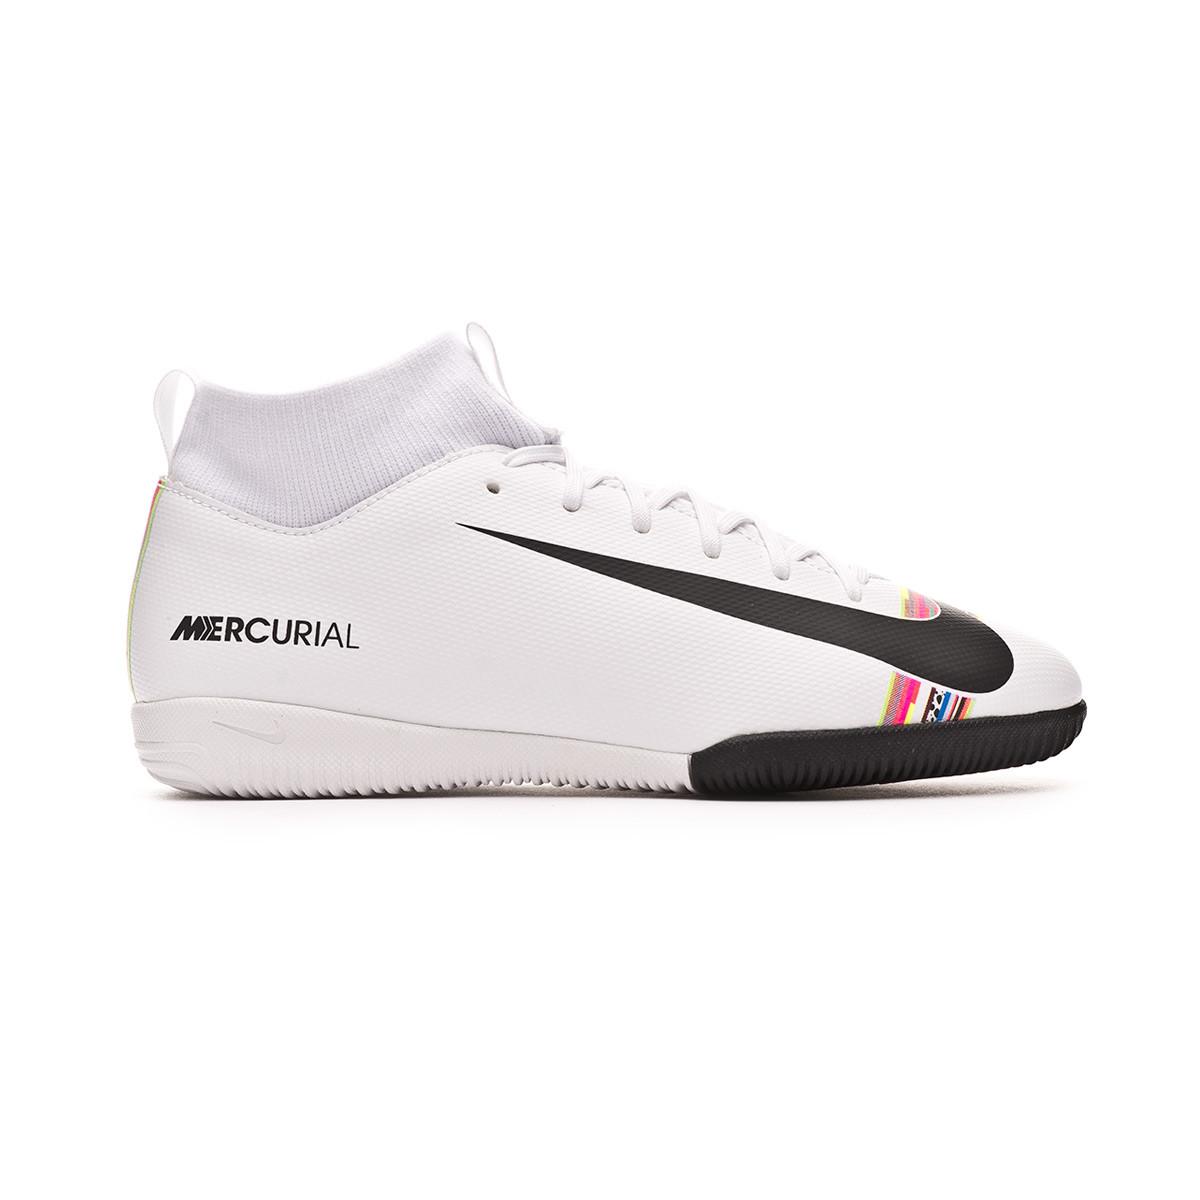 Sapatilha de Futsal Nike Mercurial SuperflyX VI Academy CR7